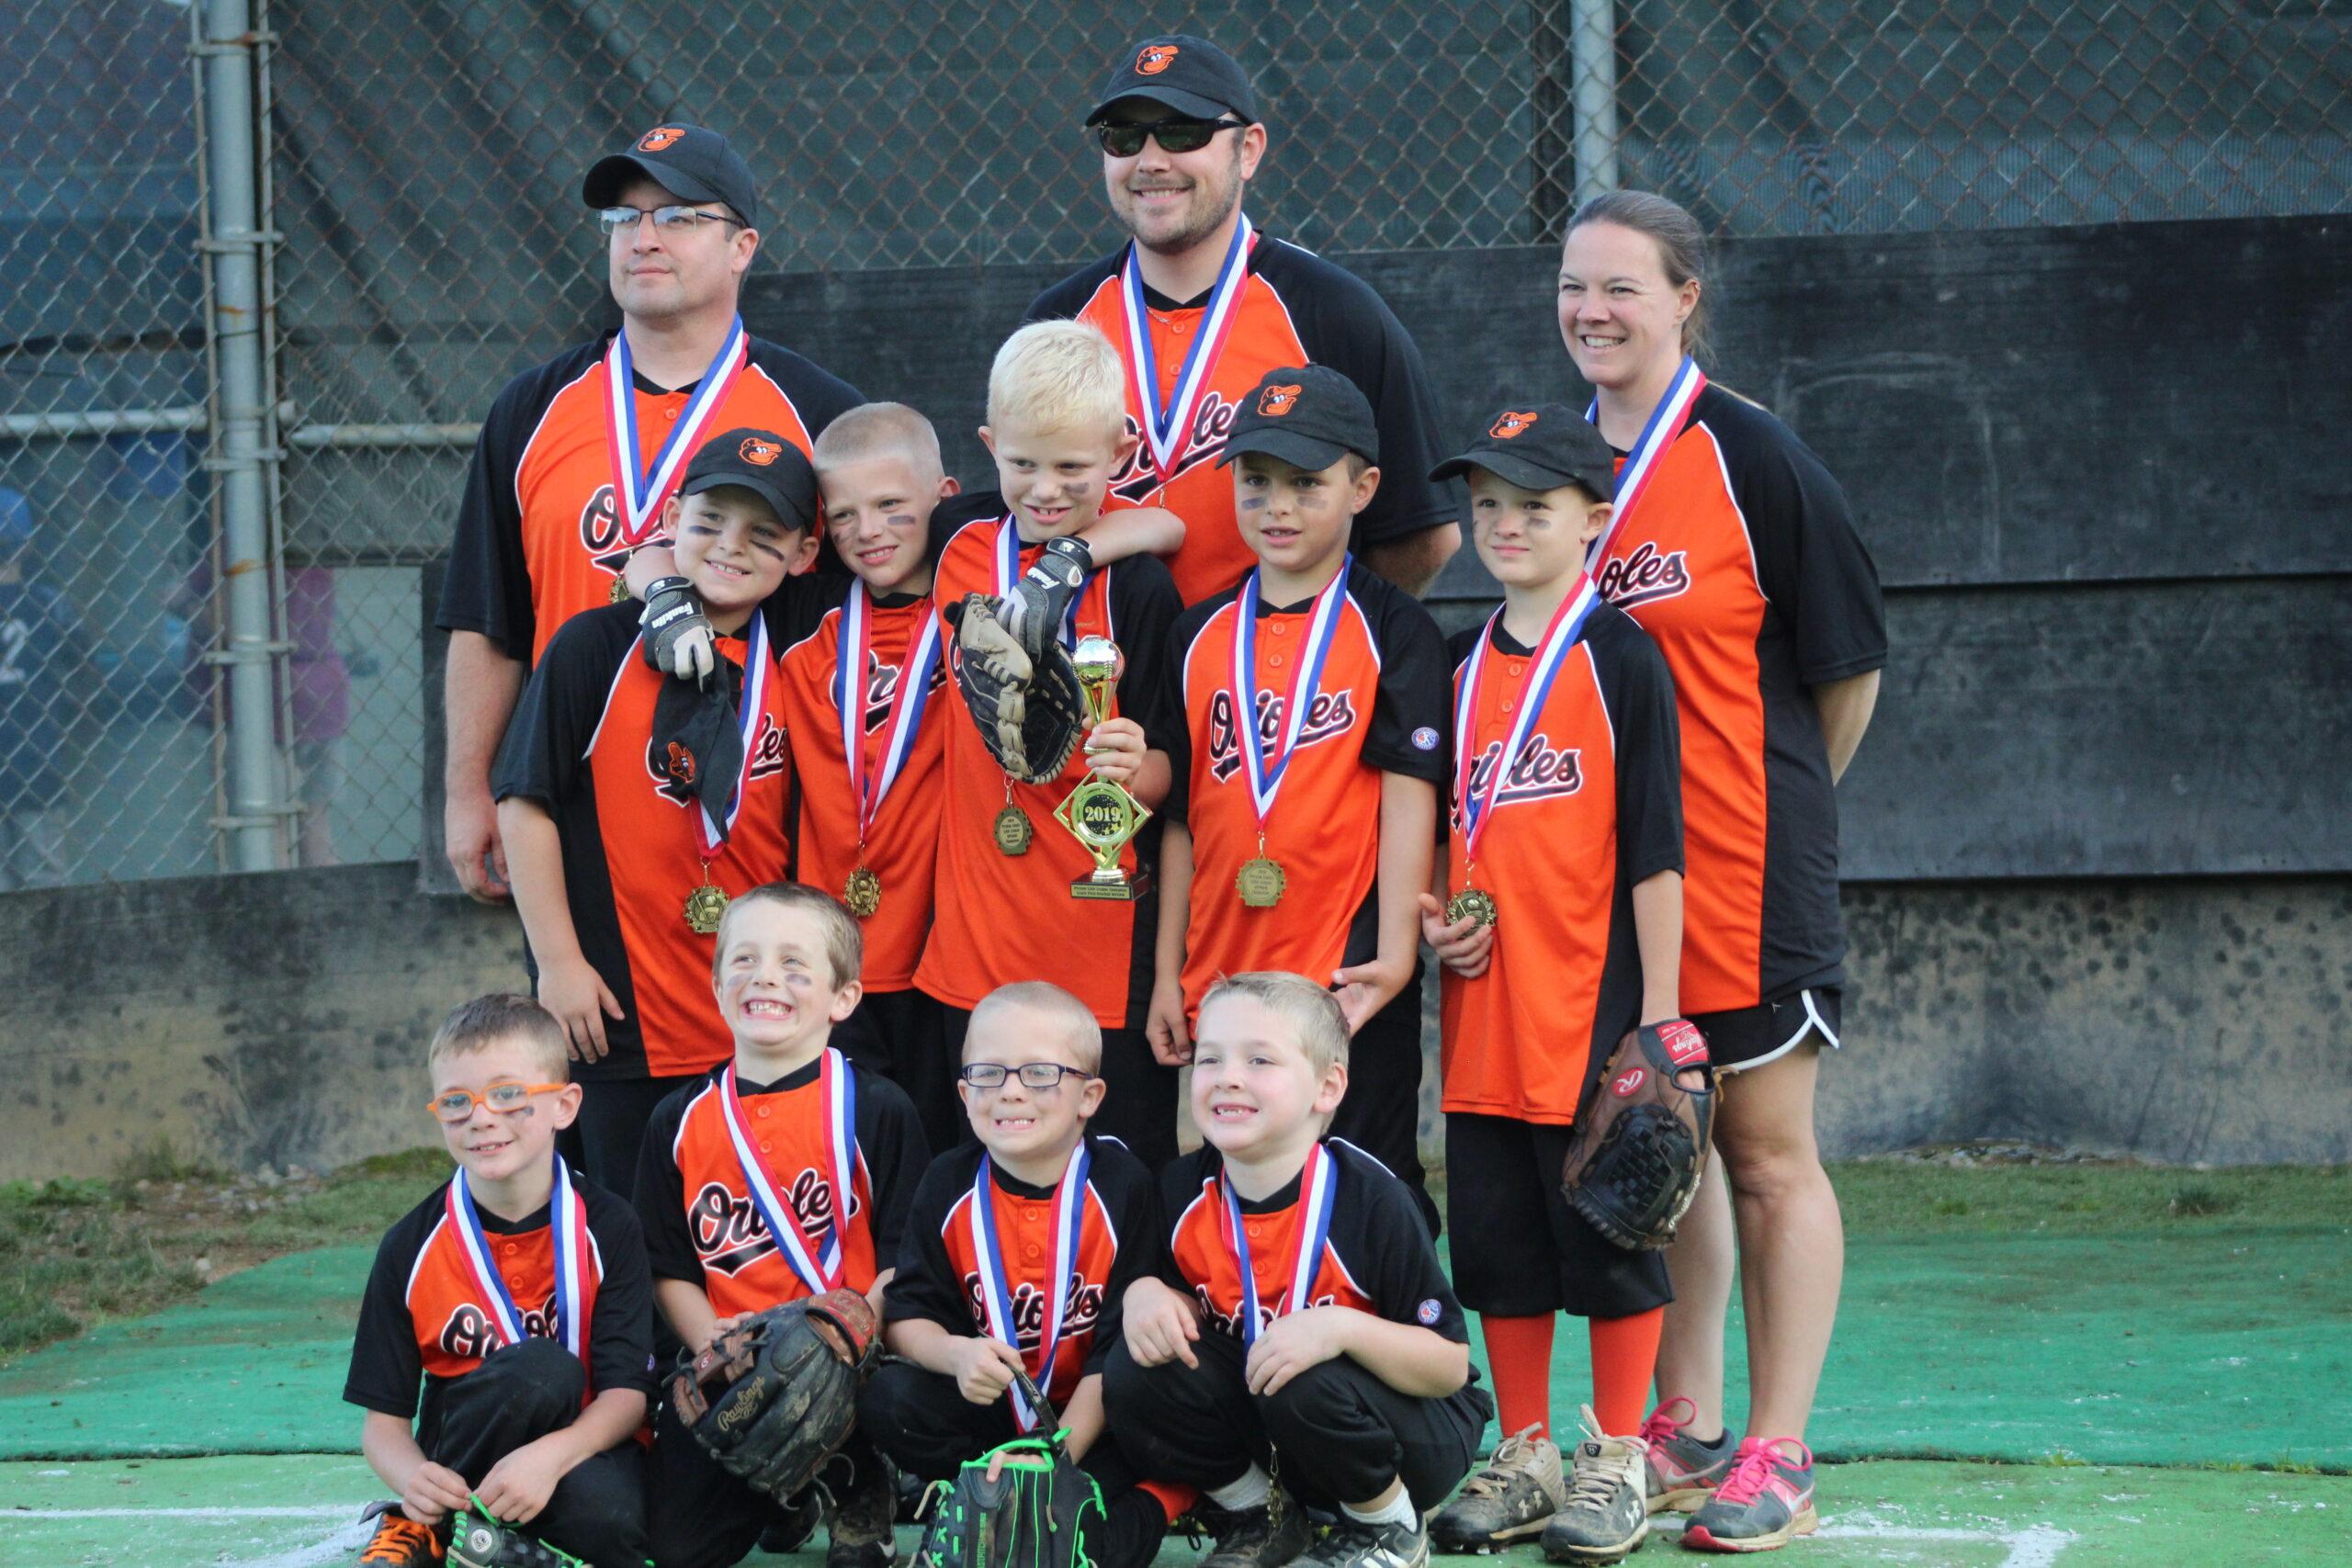 Preston Little League Orioles team